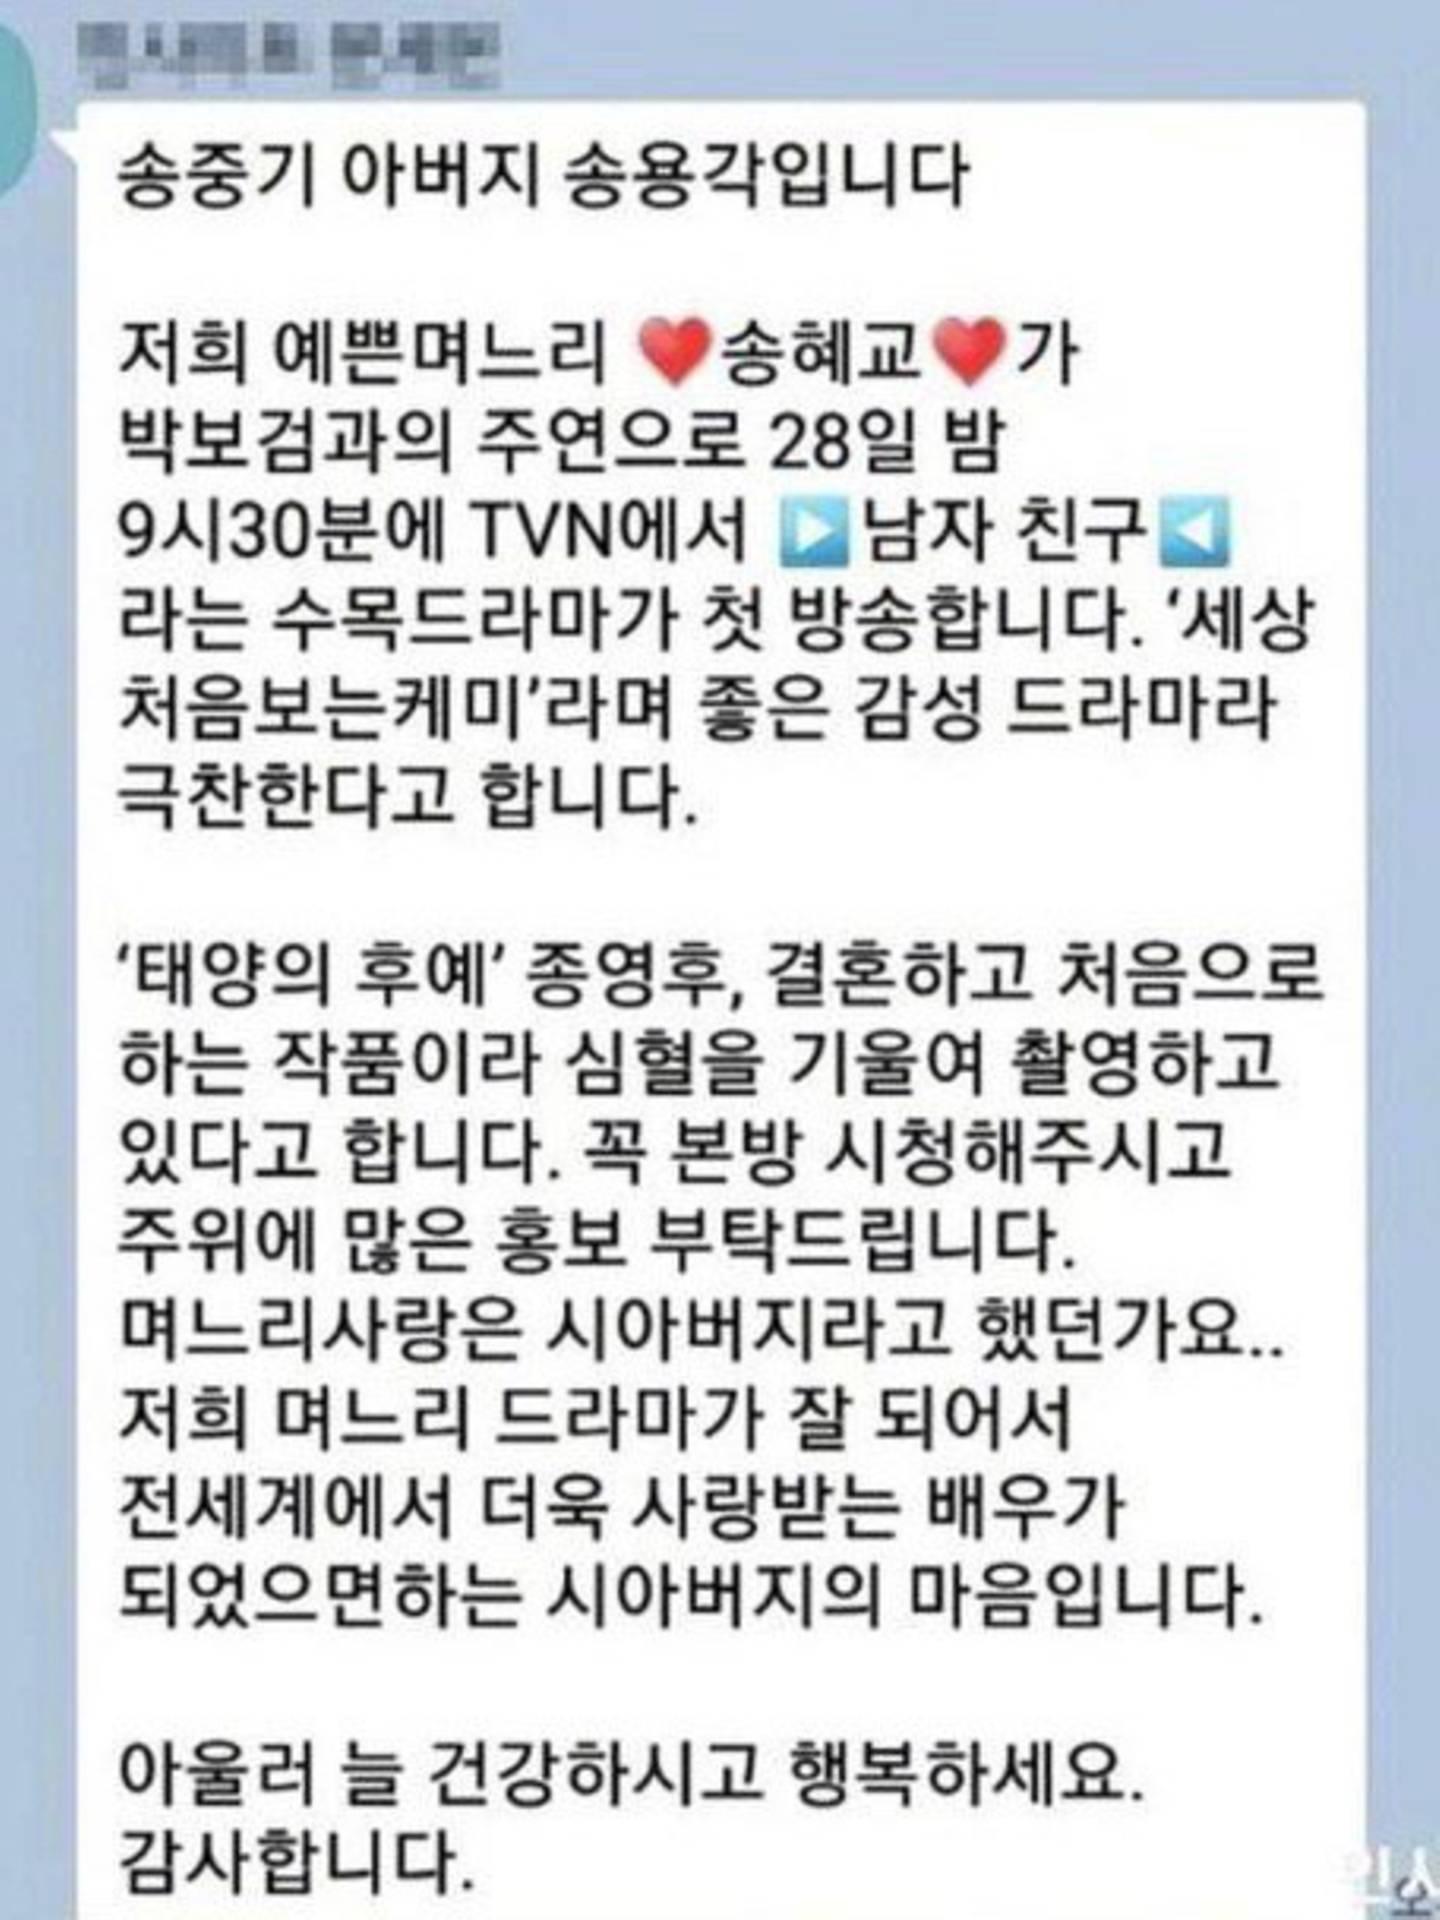 Ayah Song Joong Ki Mengatakan Perceraian Song Joong Ki dan Song Hye Kyo Adalah Kesalahannya Dan Putranya 3